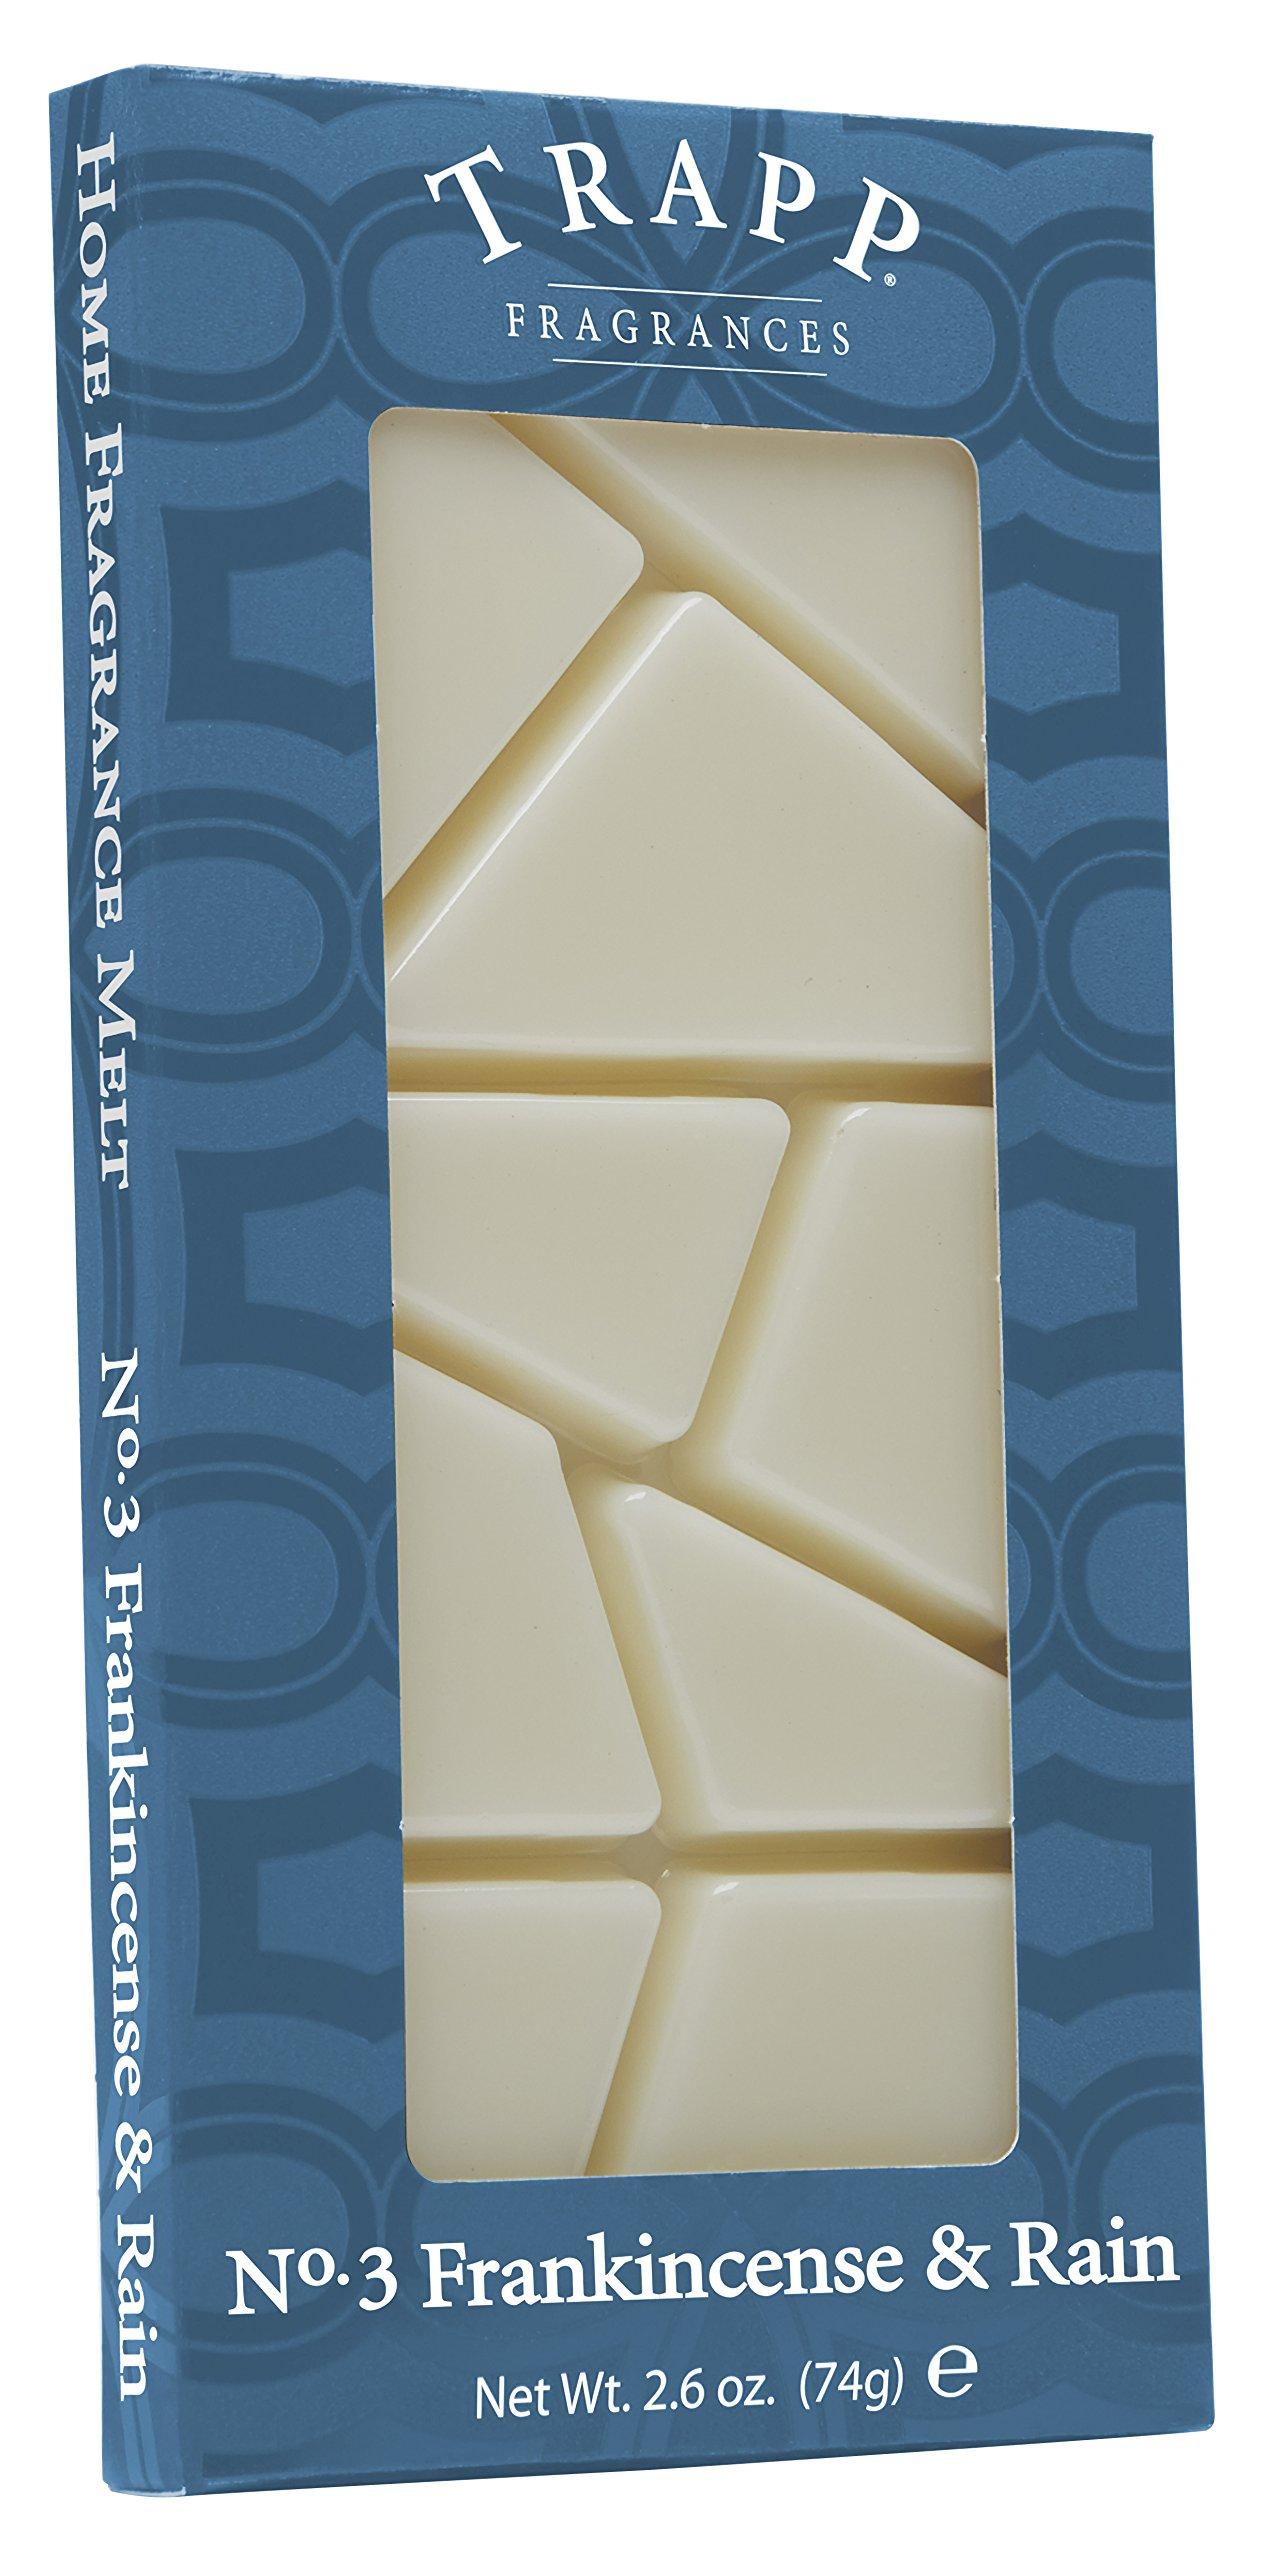 Trapp Home Fragrance Melt, No. 3 Frankincense & Rain, 2.6-Ounce